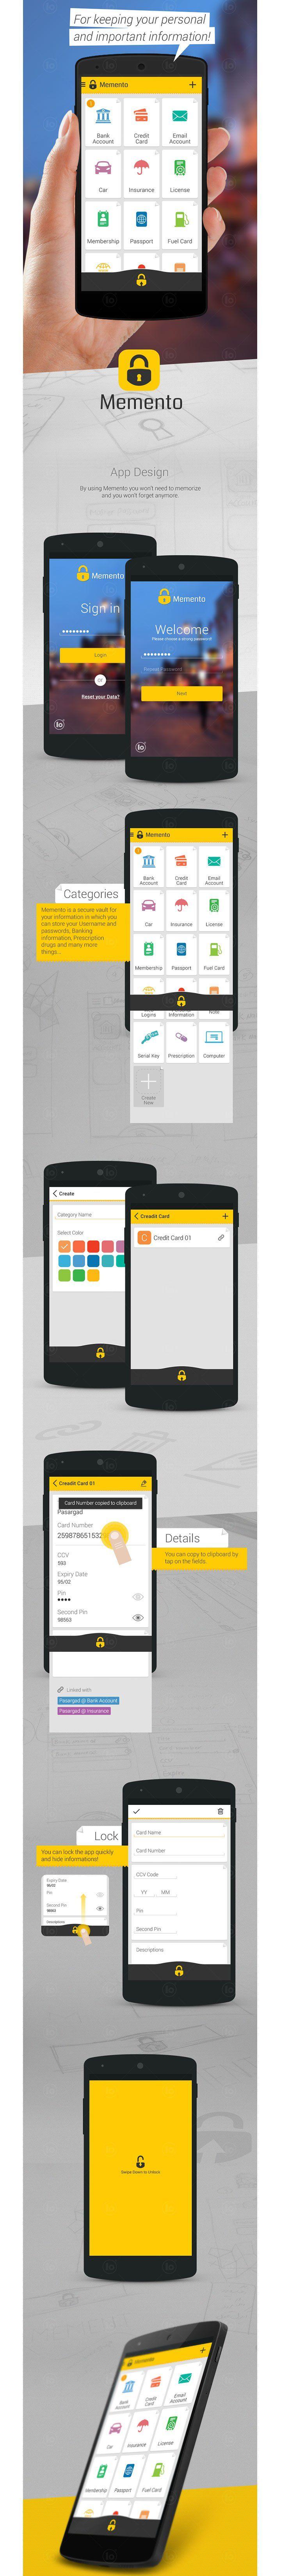 Memento_App Design